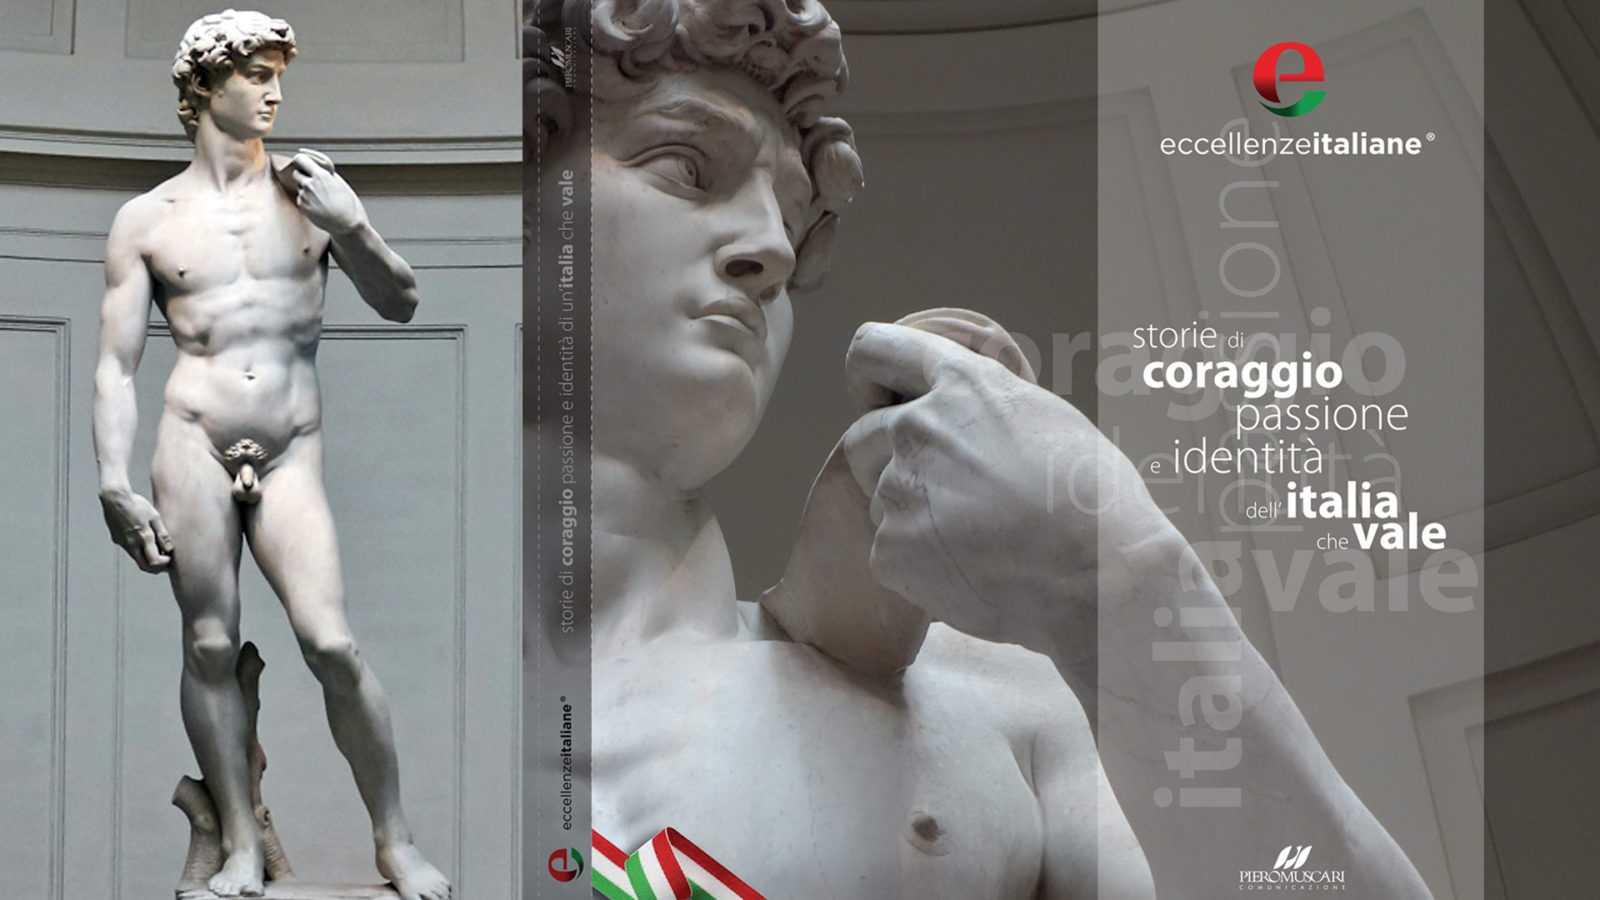 david-michelangelo-copertina-eccellenze_italiane edizione 2017.jpg